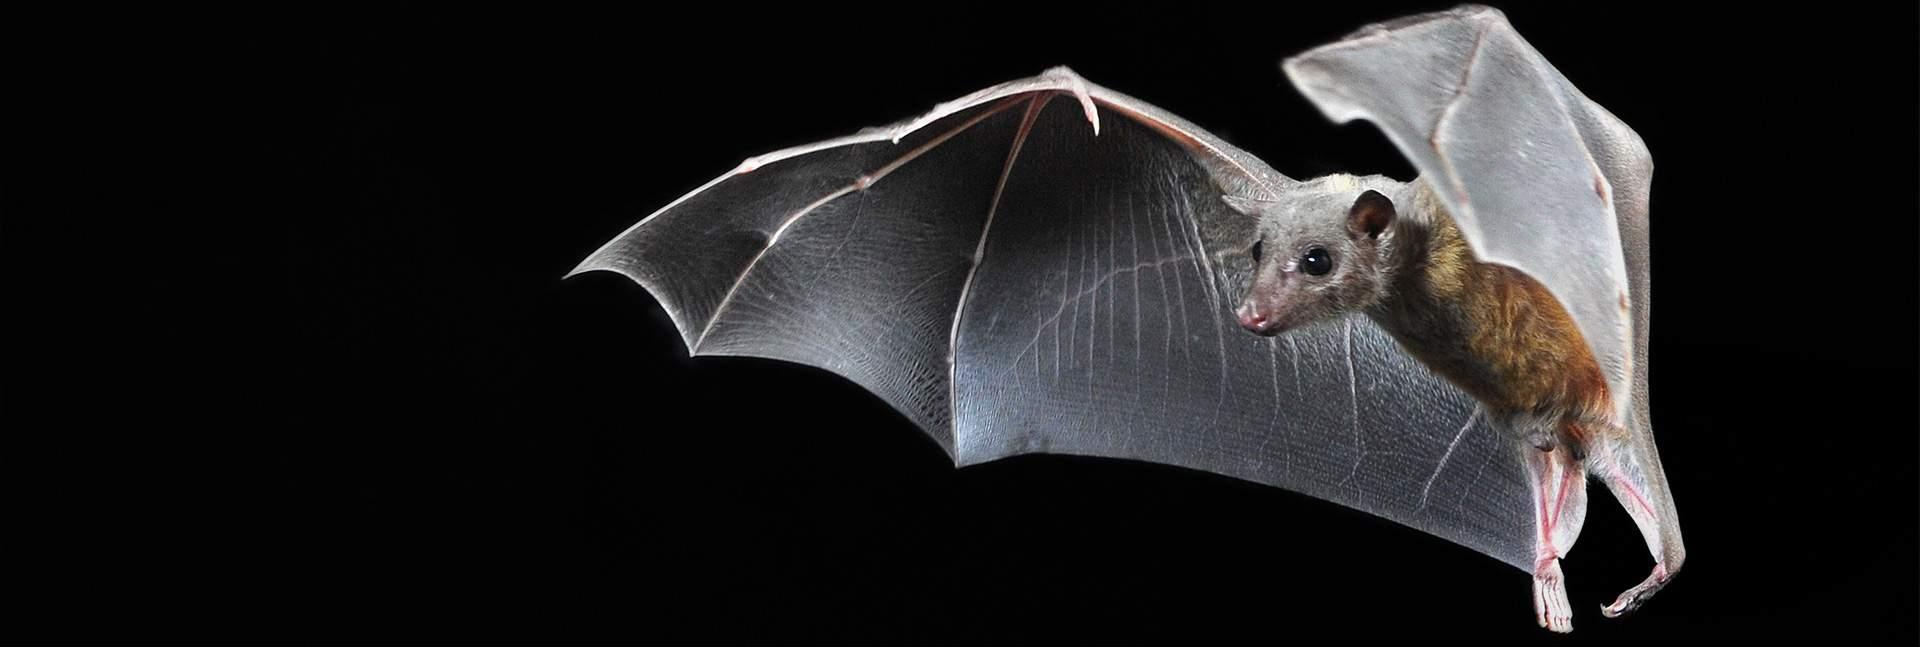 The Egyptian fruit bat